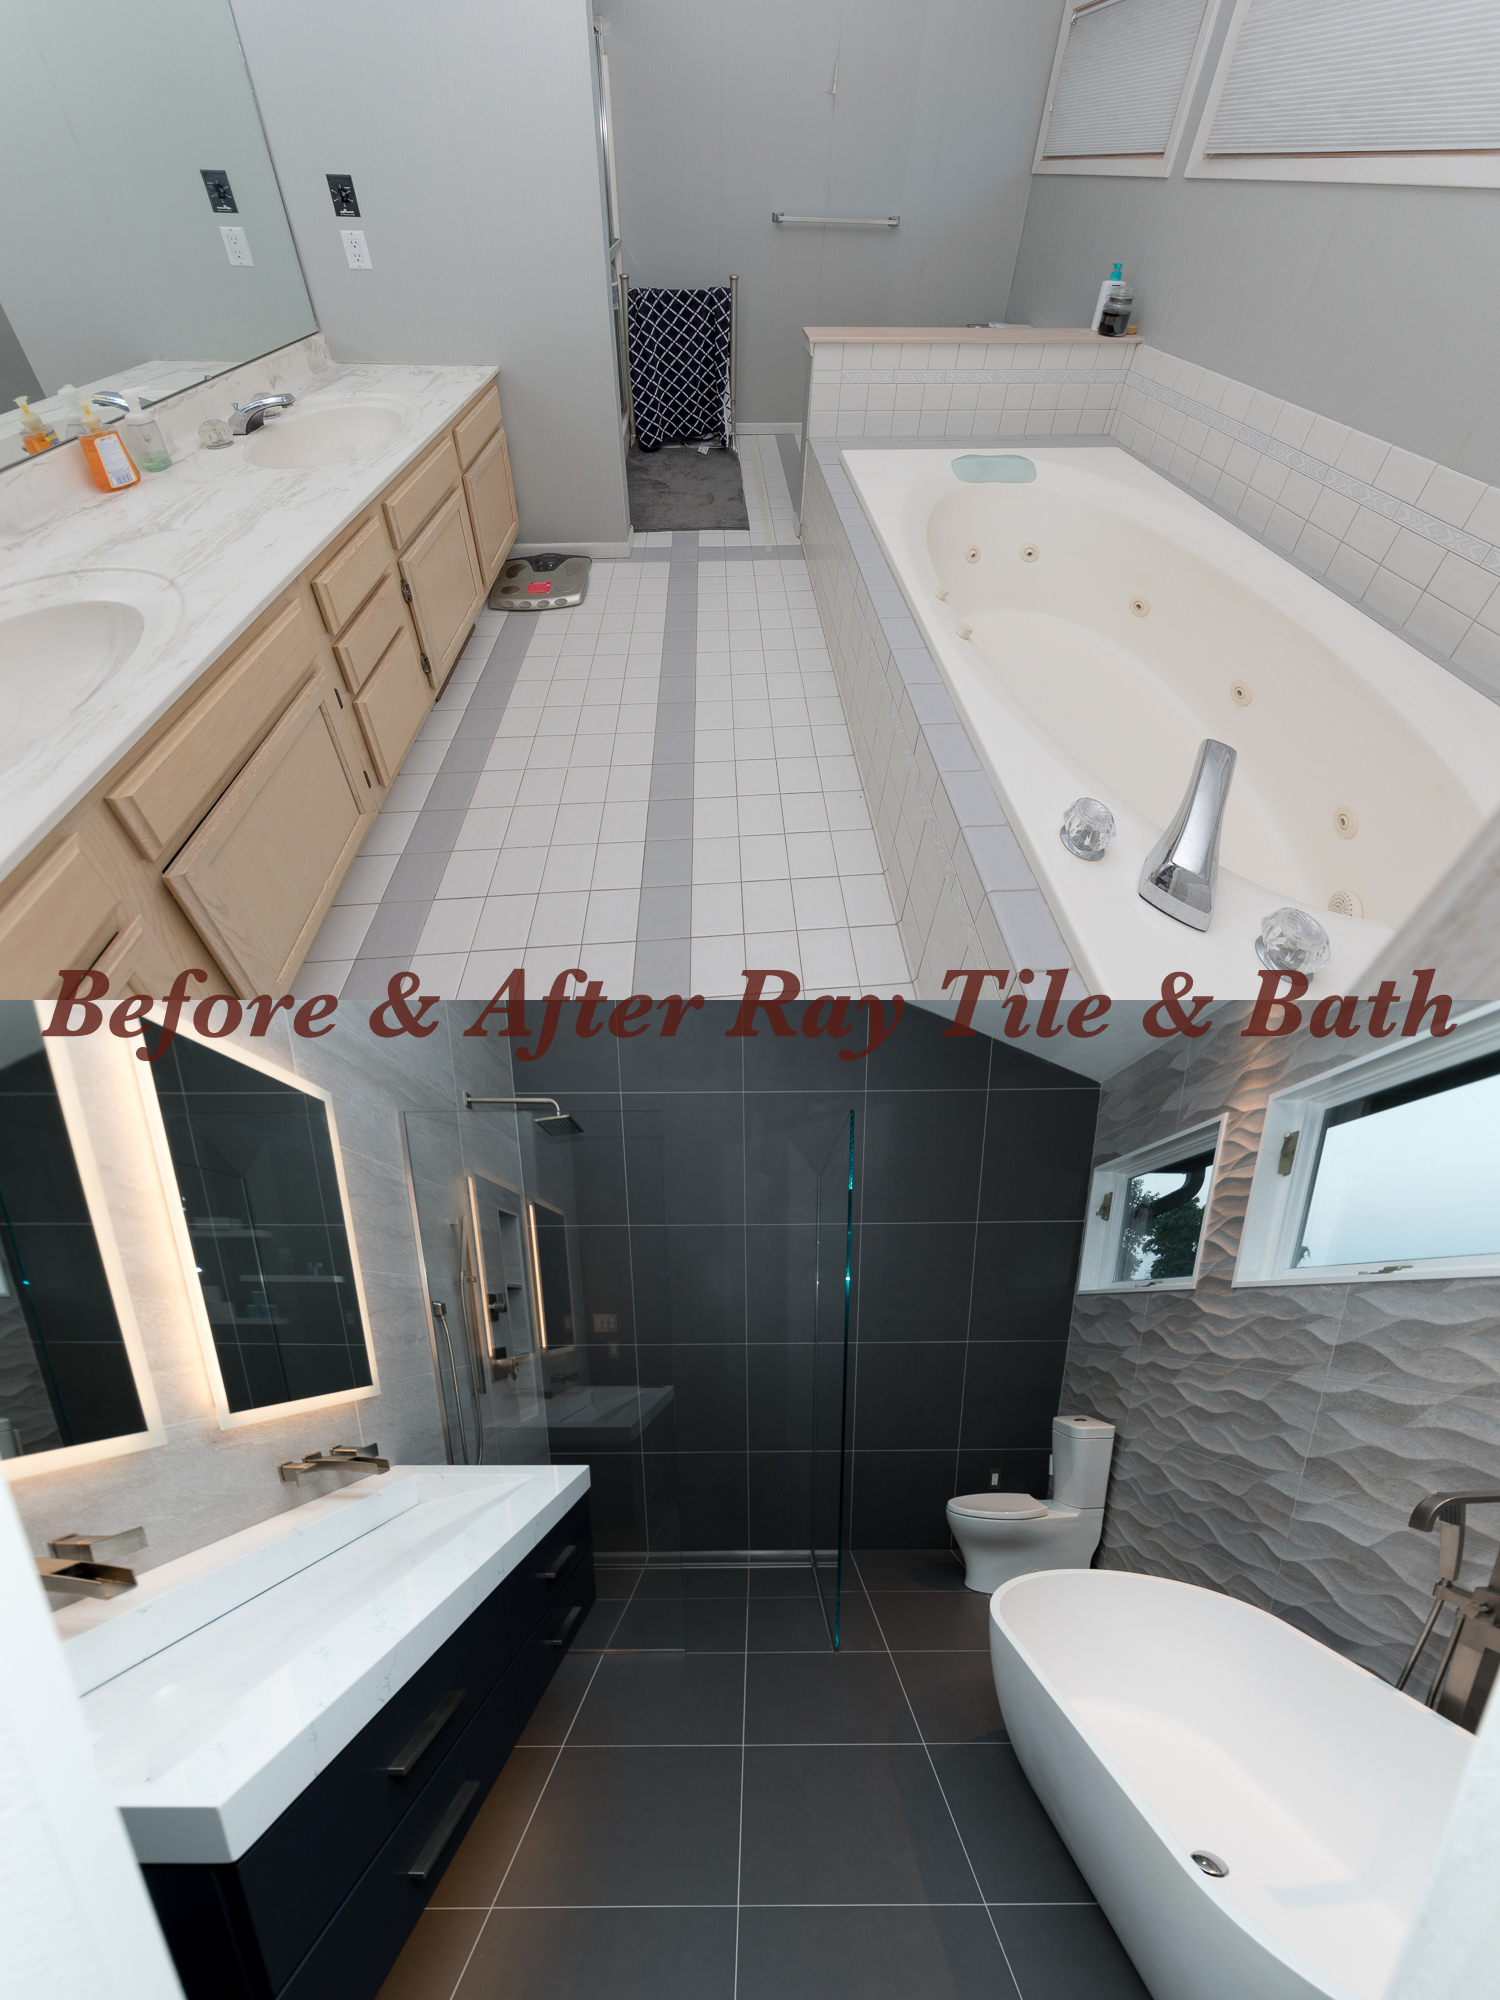 WM - B4&AF full room shower view up down!.jpg